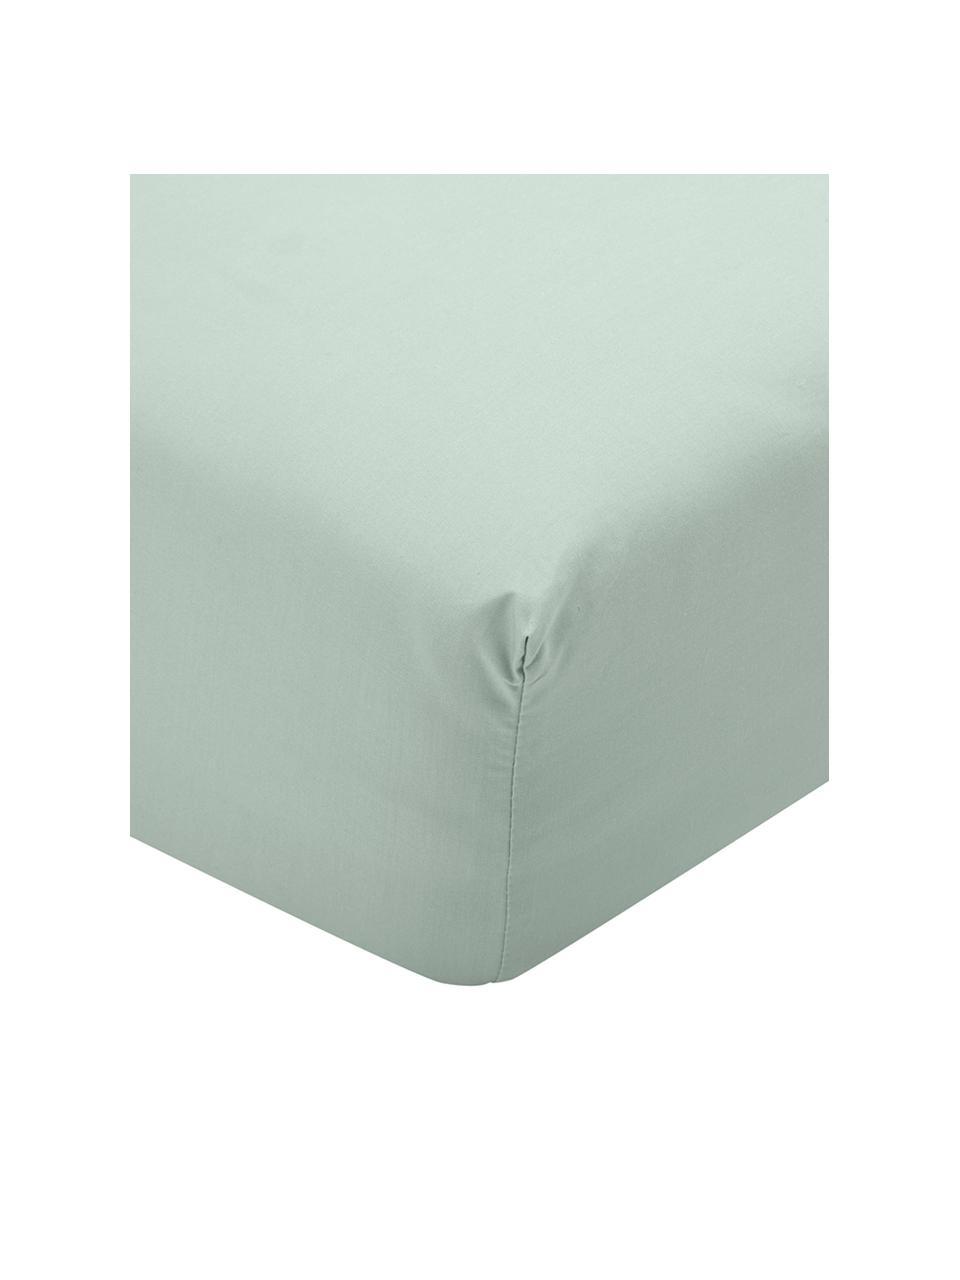 Lenzuolo con angoli in percalle verde salvia Elsie, Verde salvia, Larg. 180 x Lung. 200 cm